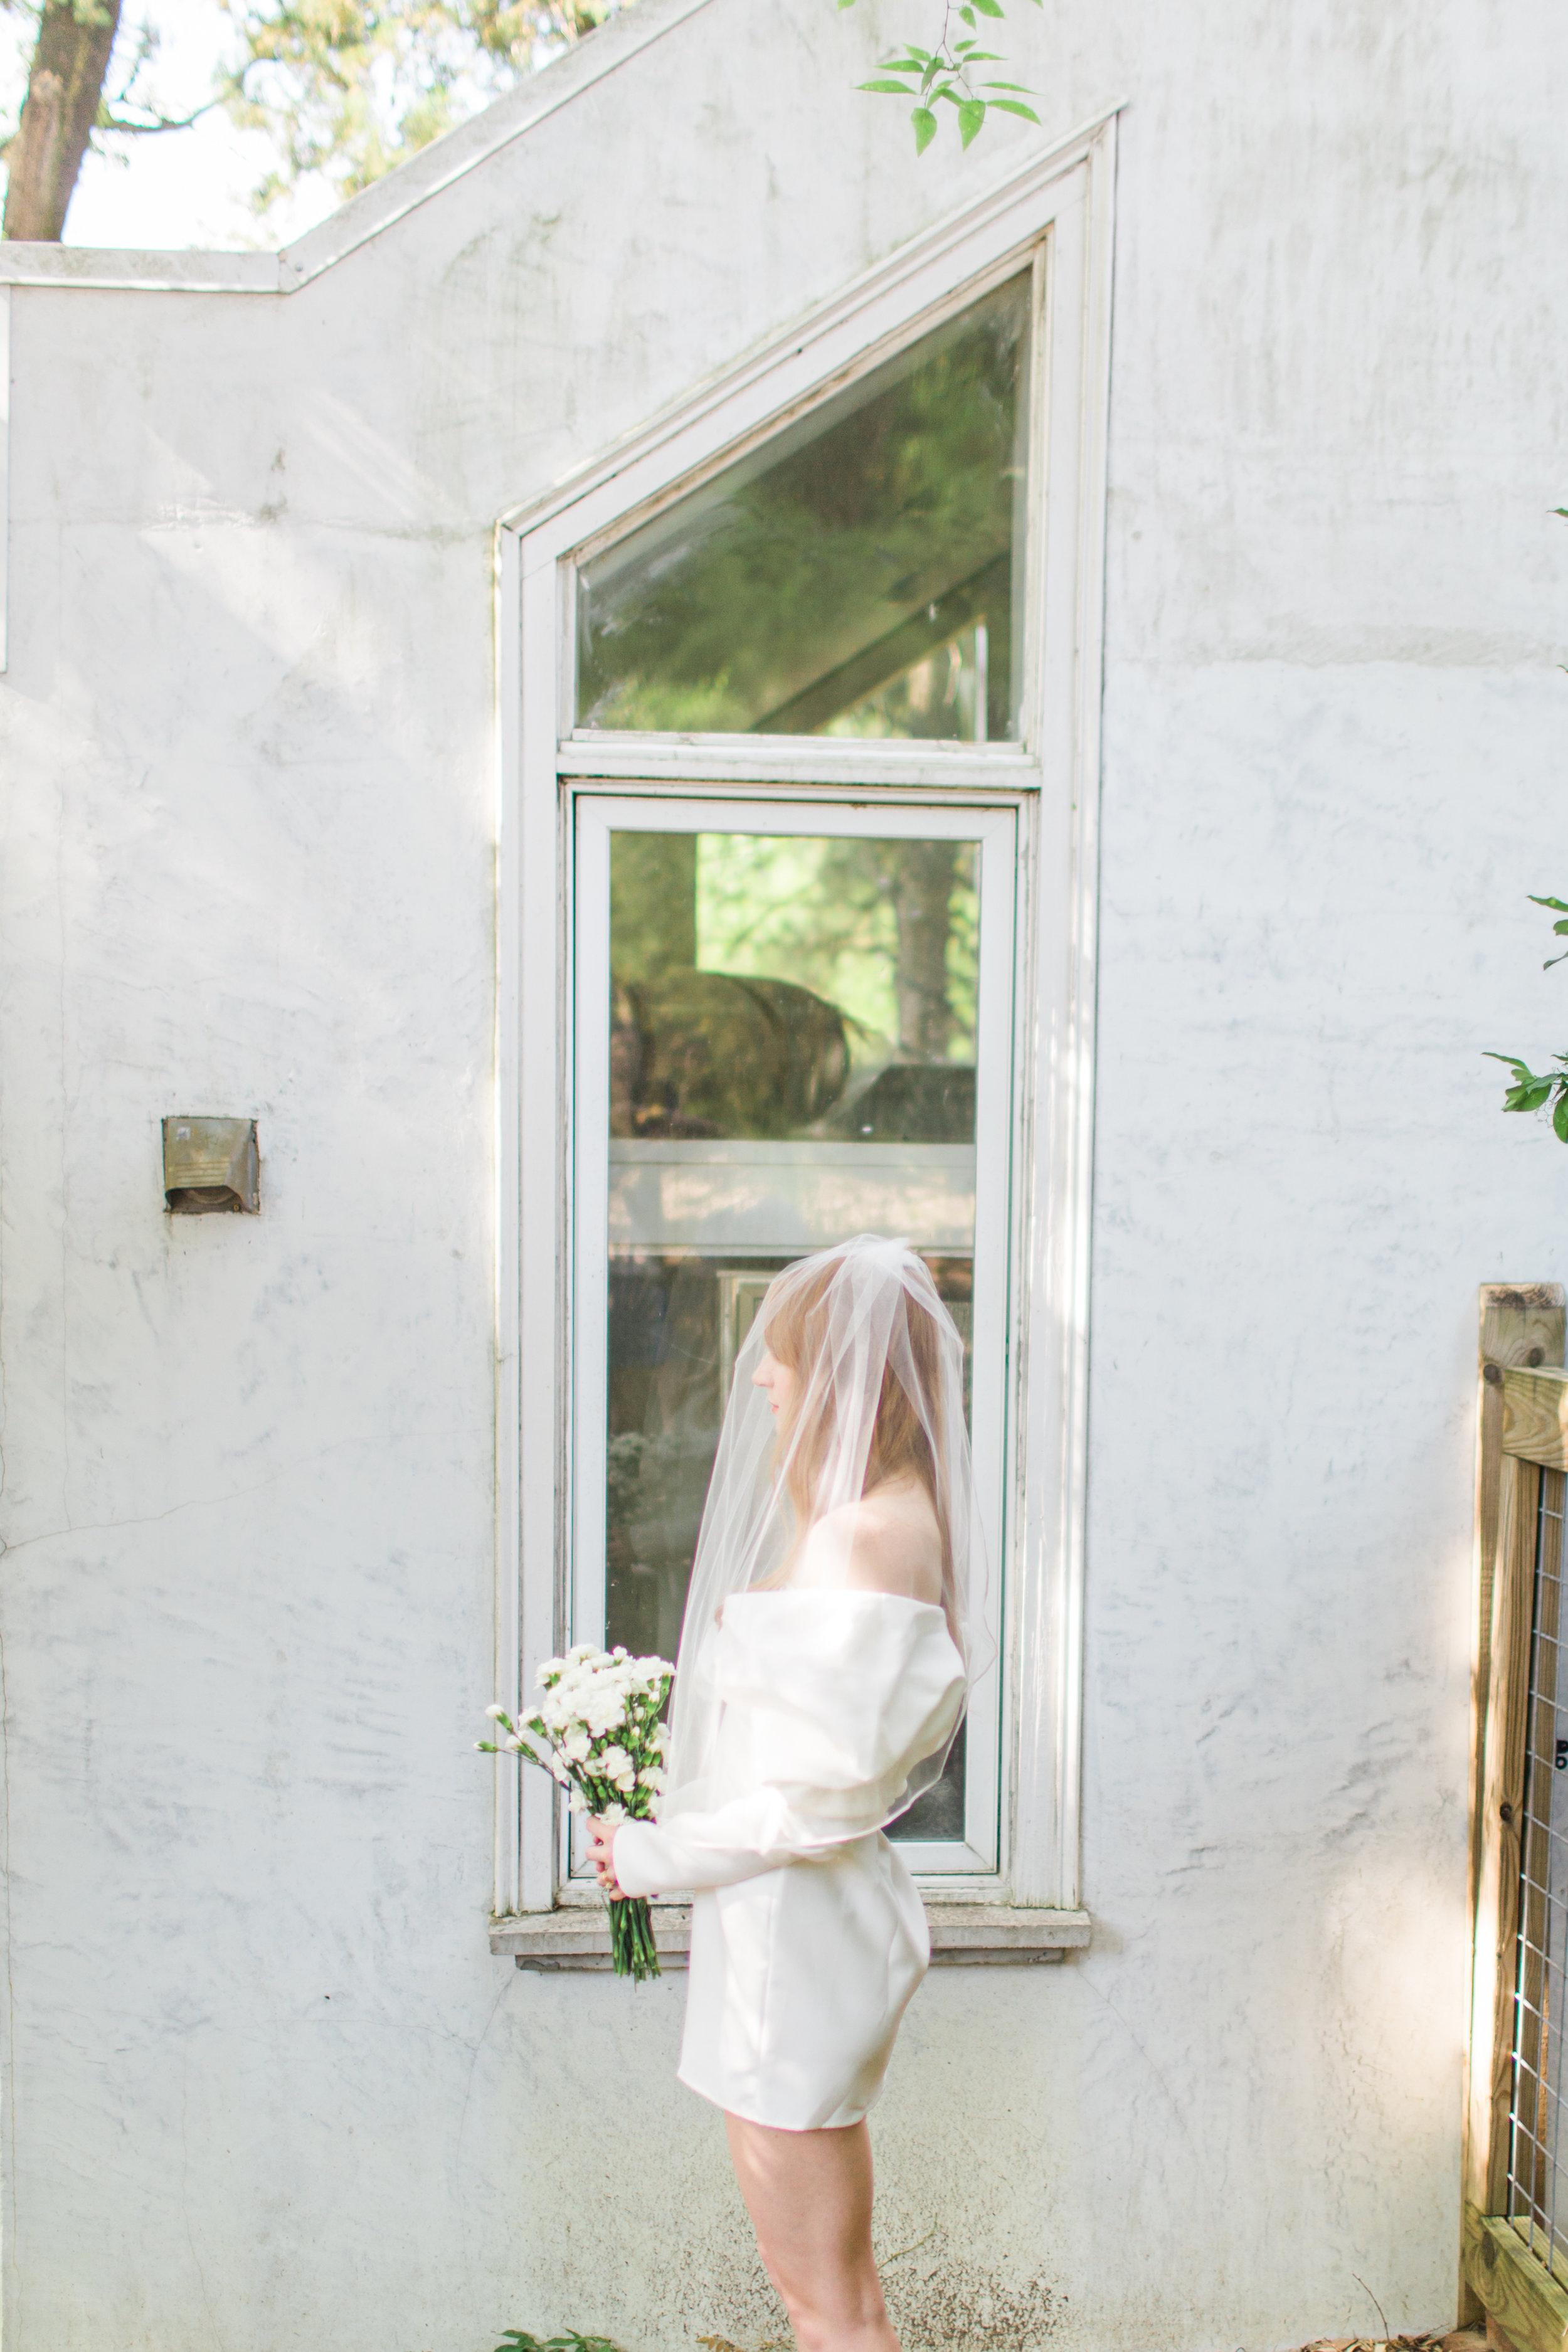 Gabriella Dress (GM) / Veil (It's a Date)